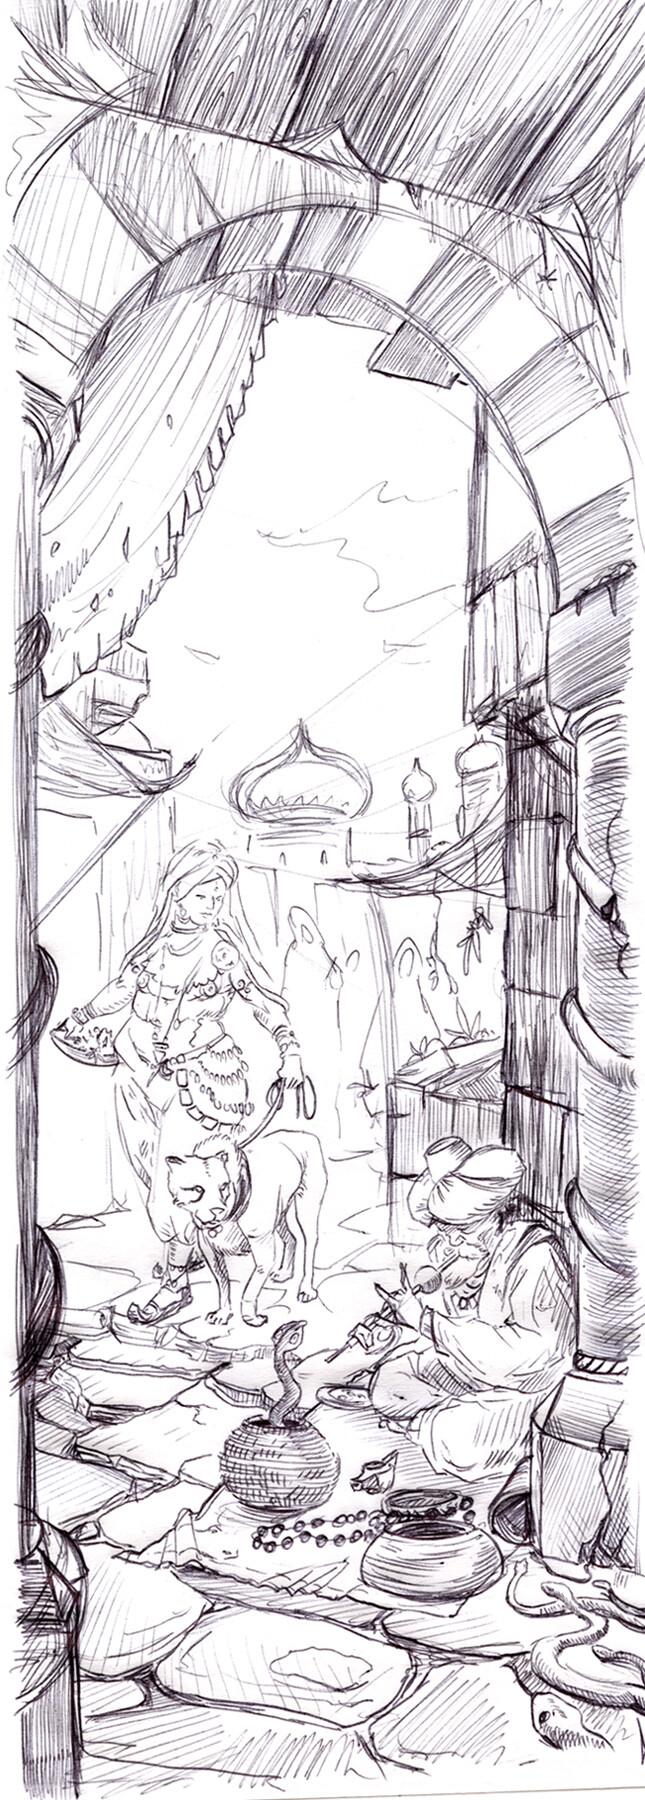 Dirk wachsmuth kapitelstarter aranien 4web sketch